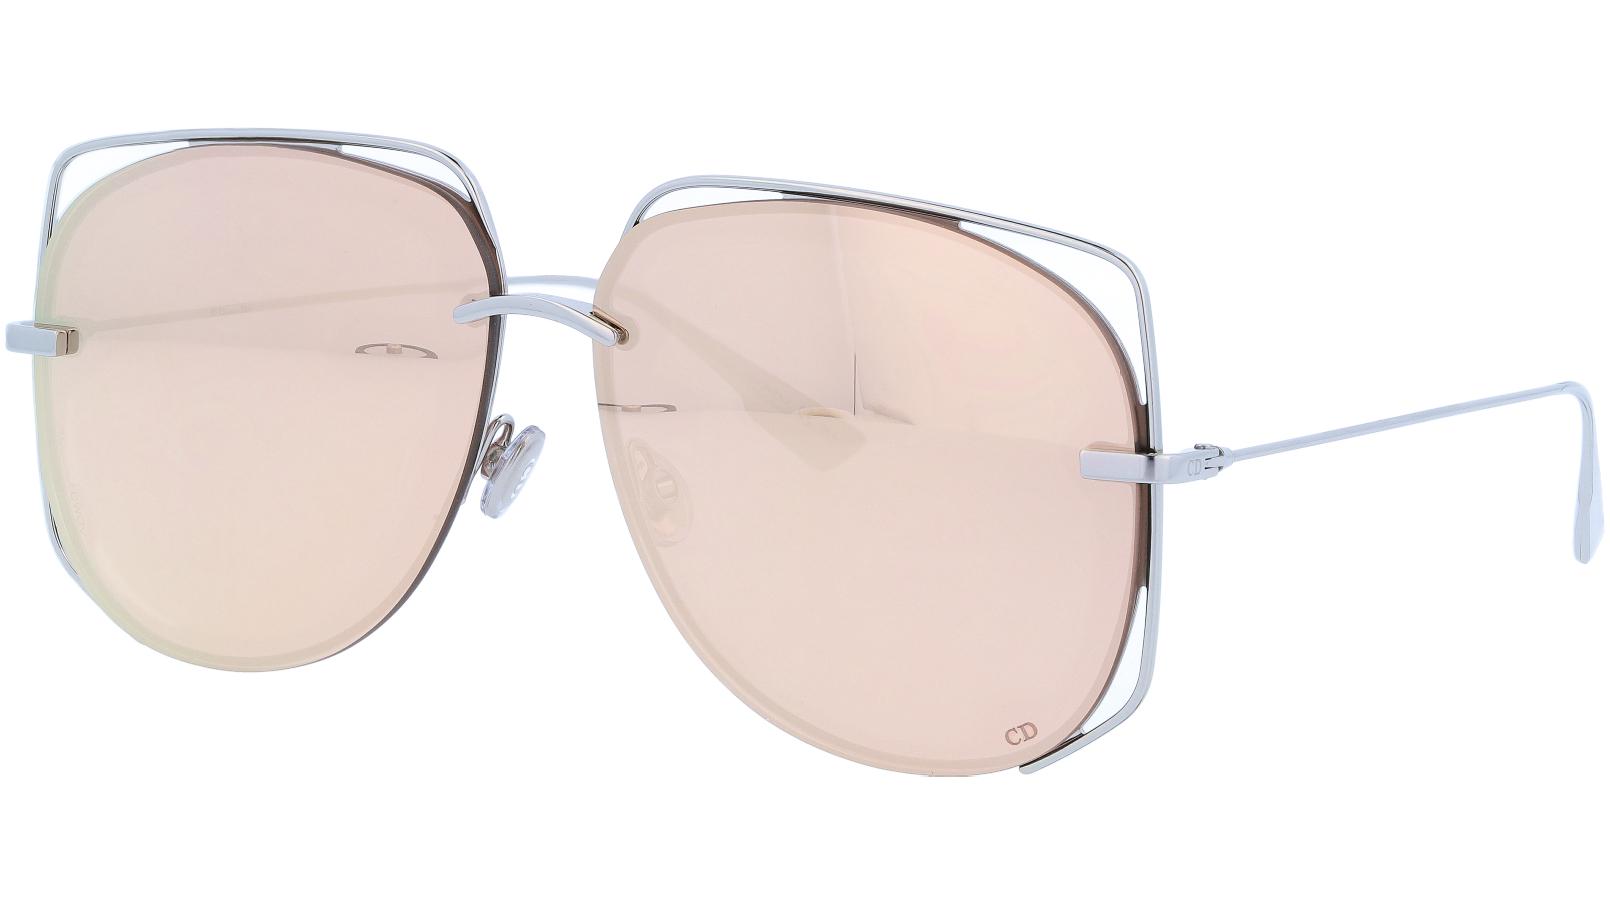 Dior Stellaire6 DDBVC 61 Gold Sunglasses